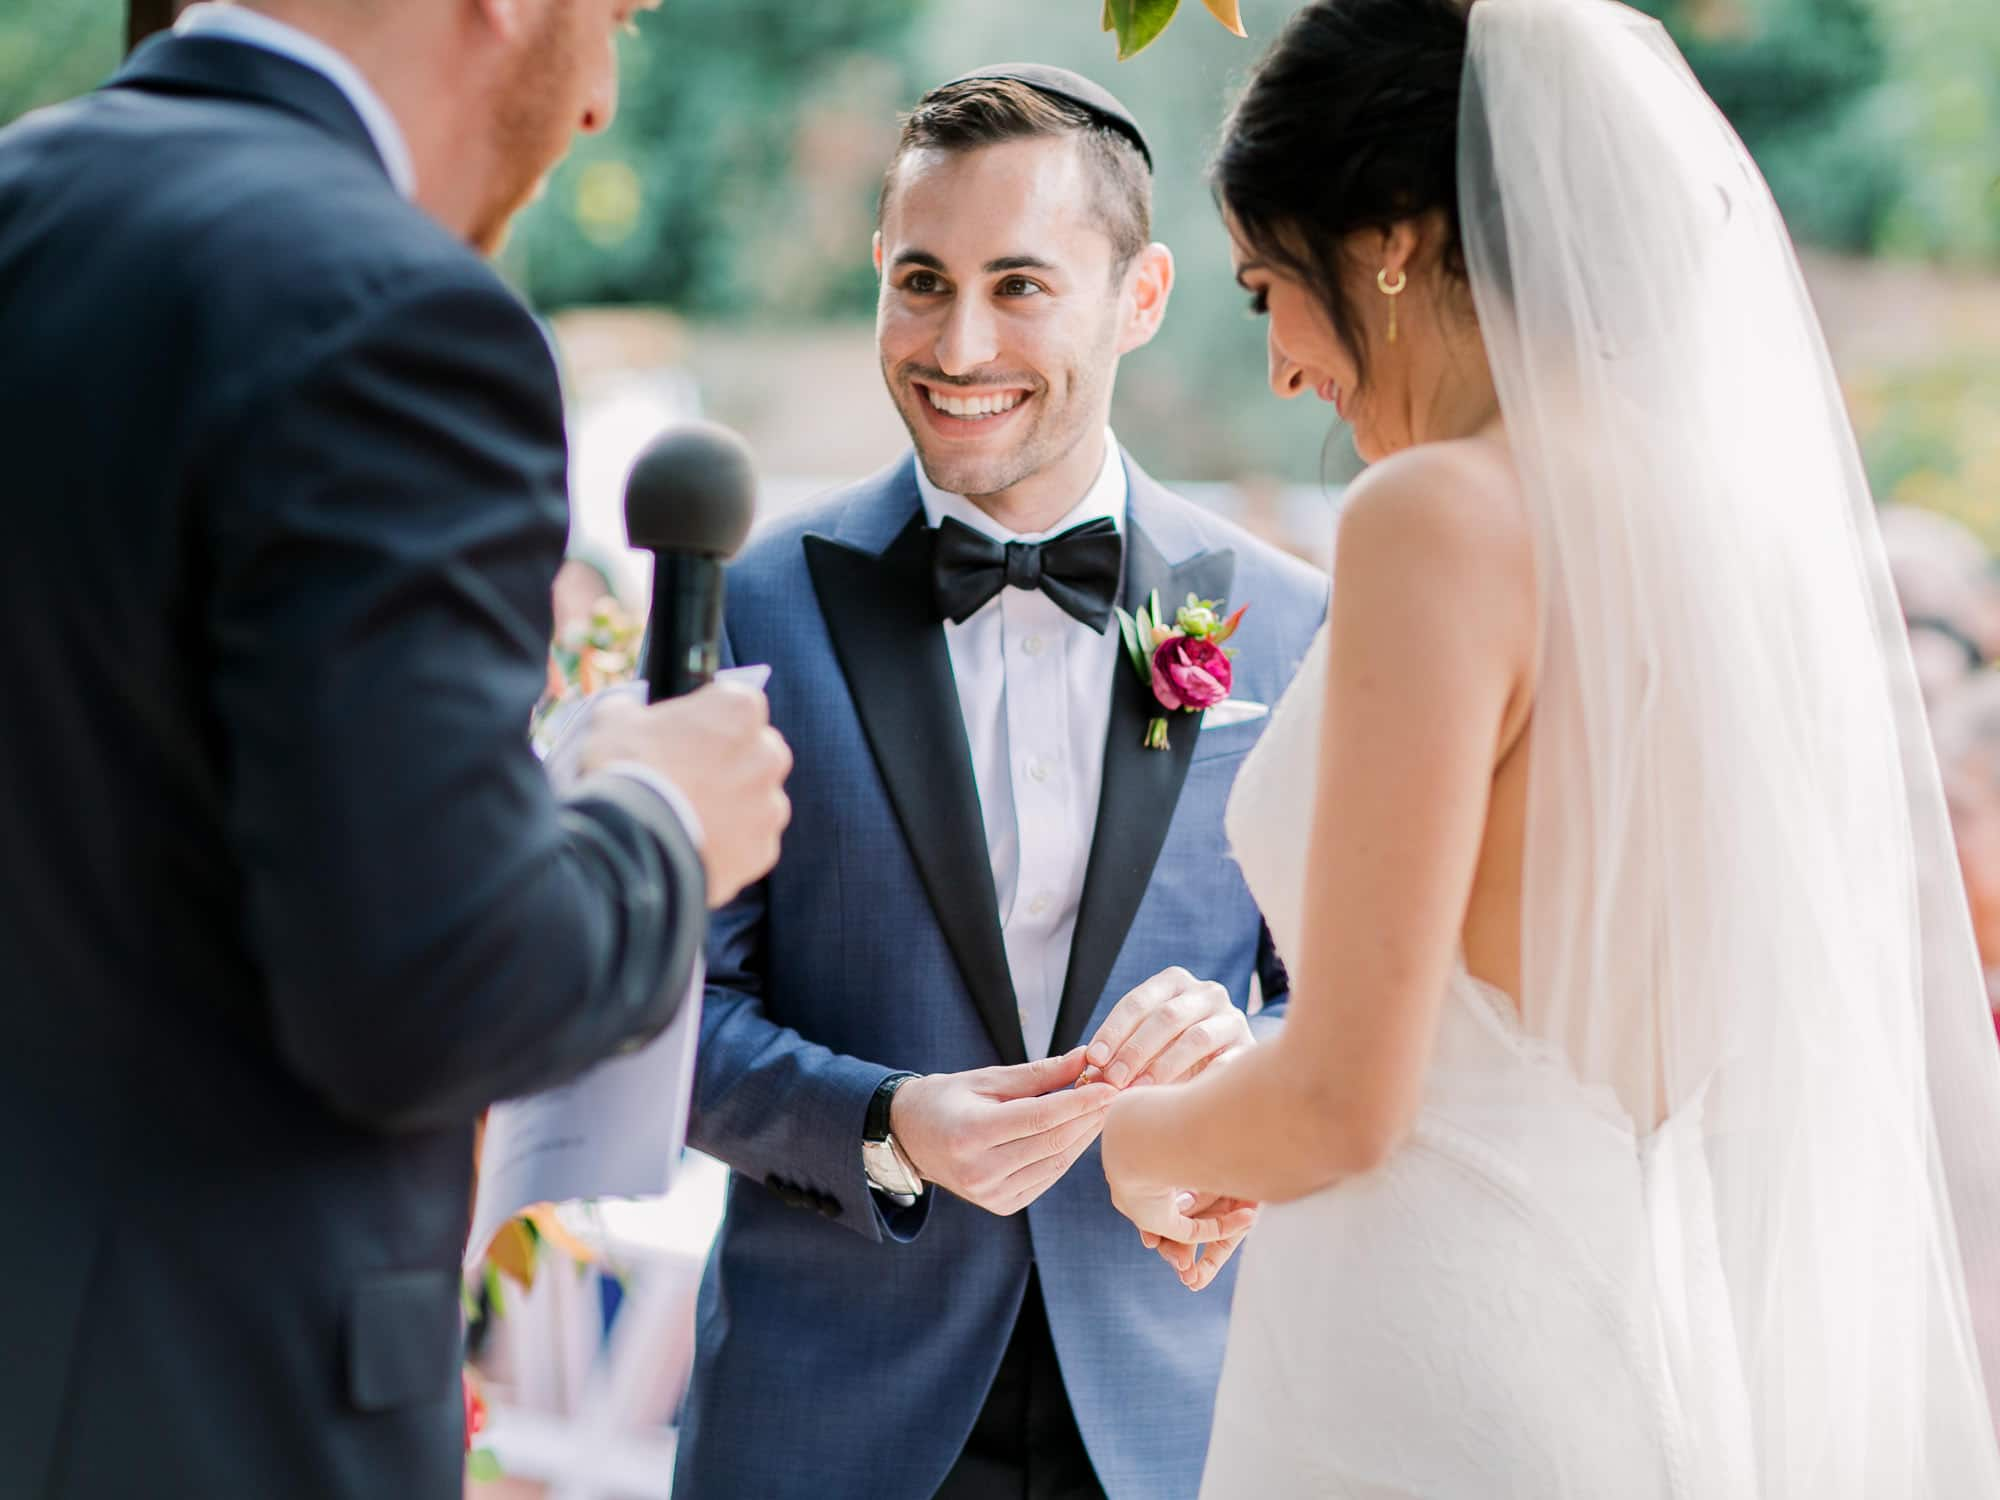 Wedding-Ring-Photo-Inspiration-Greg-Ross